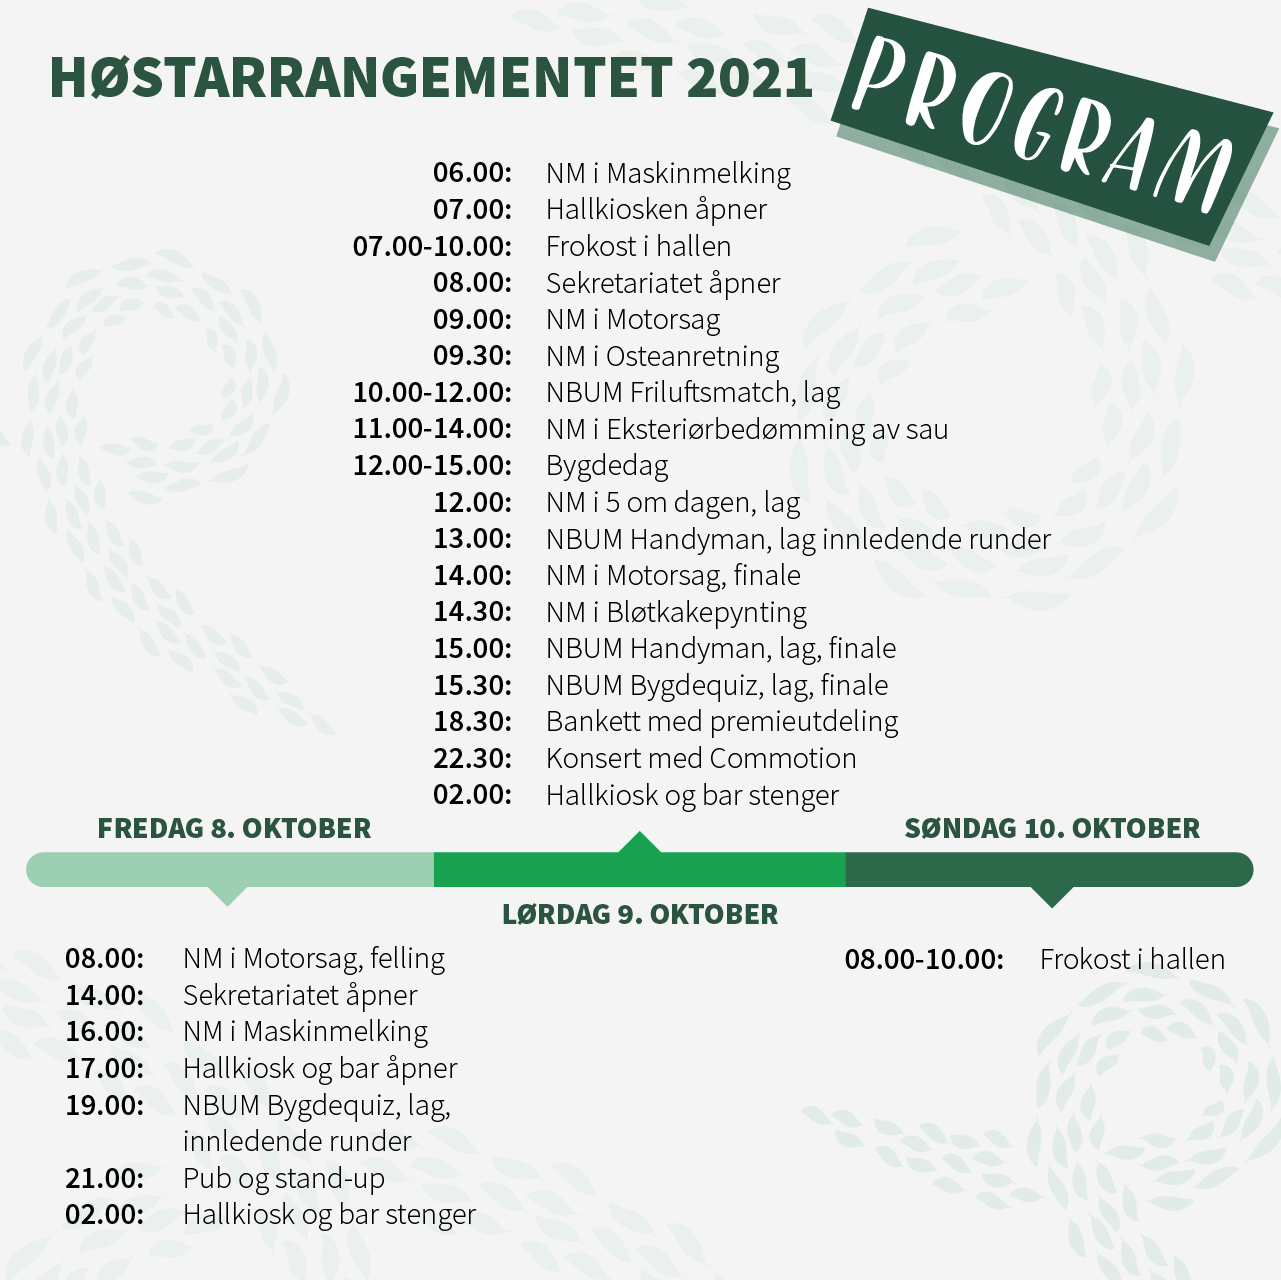 Program HA21